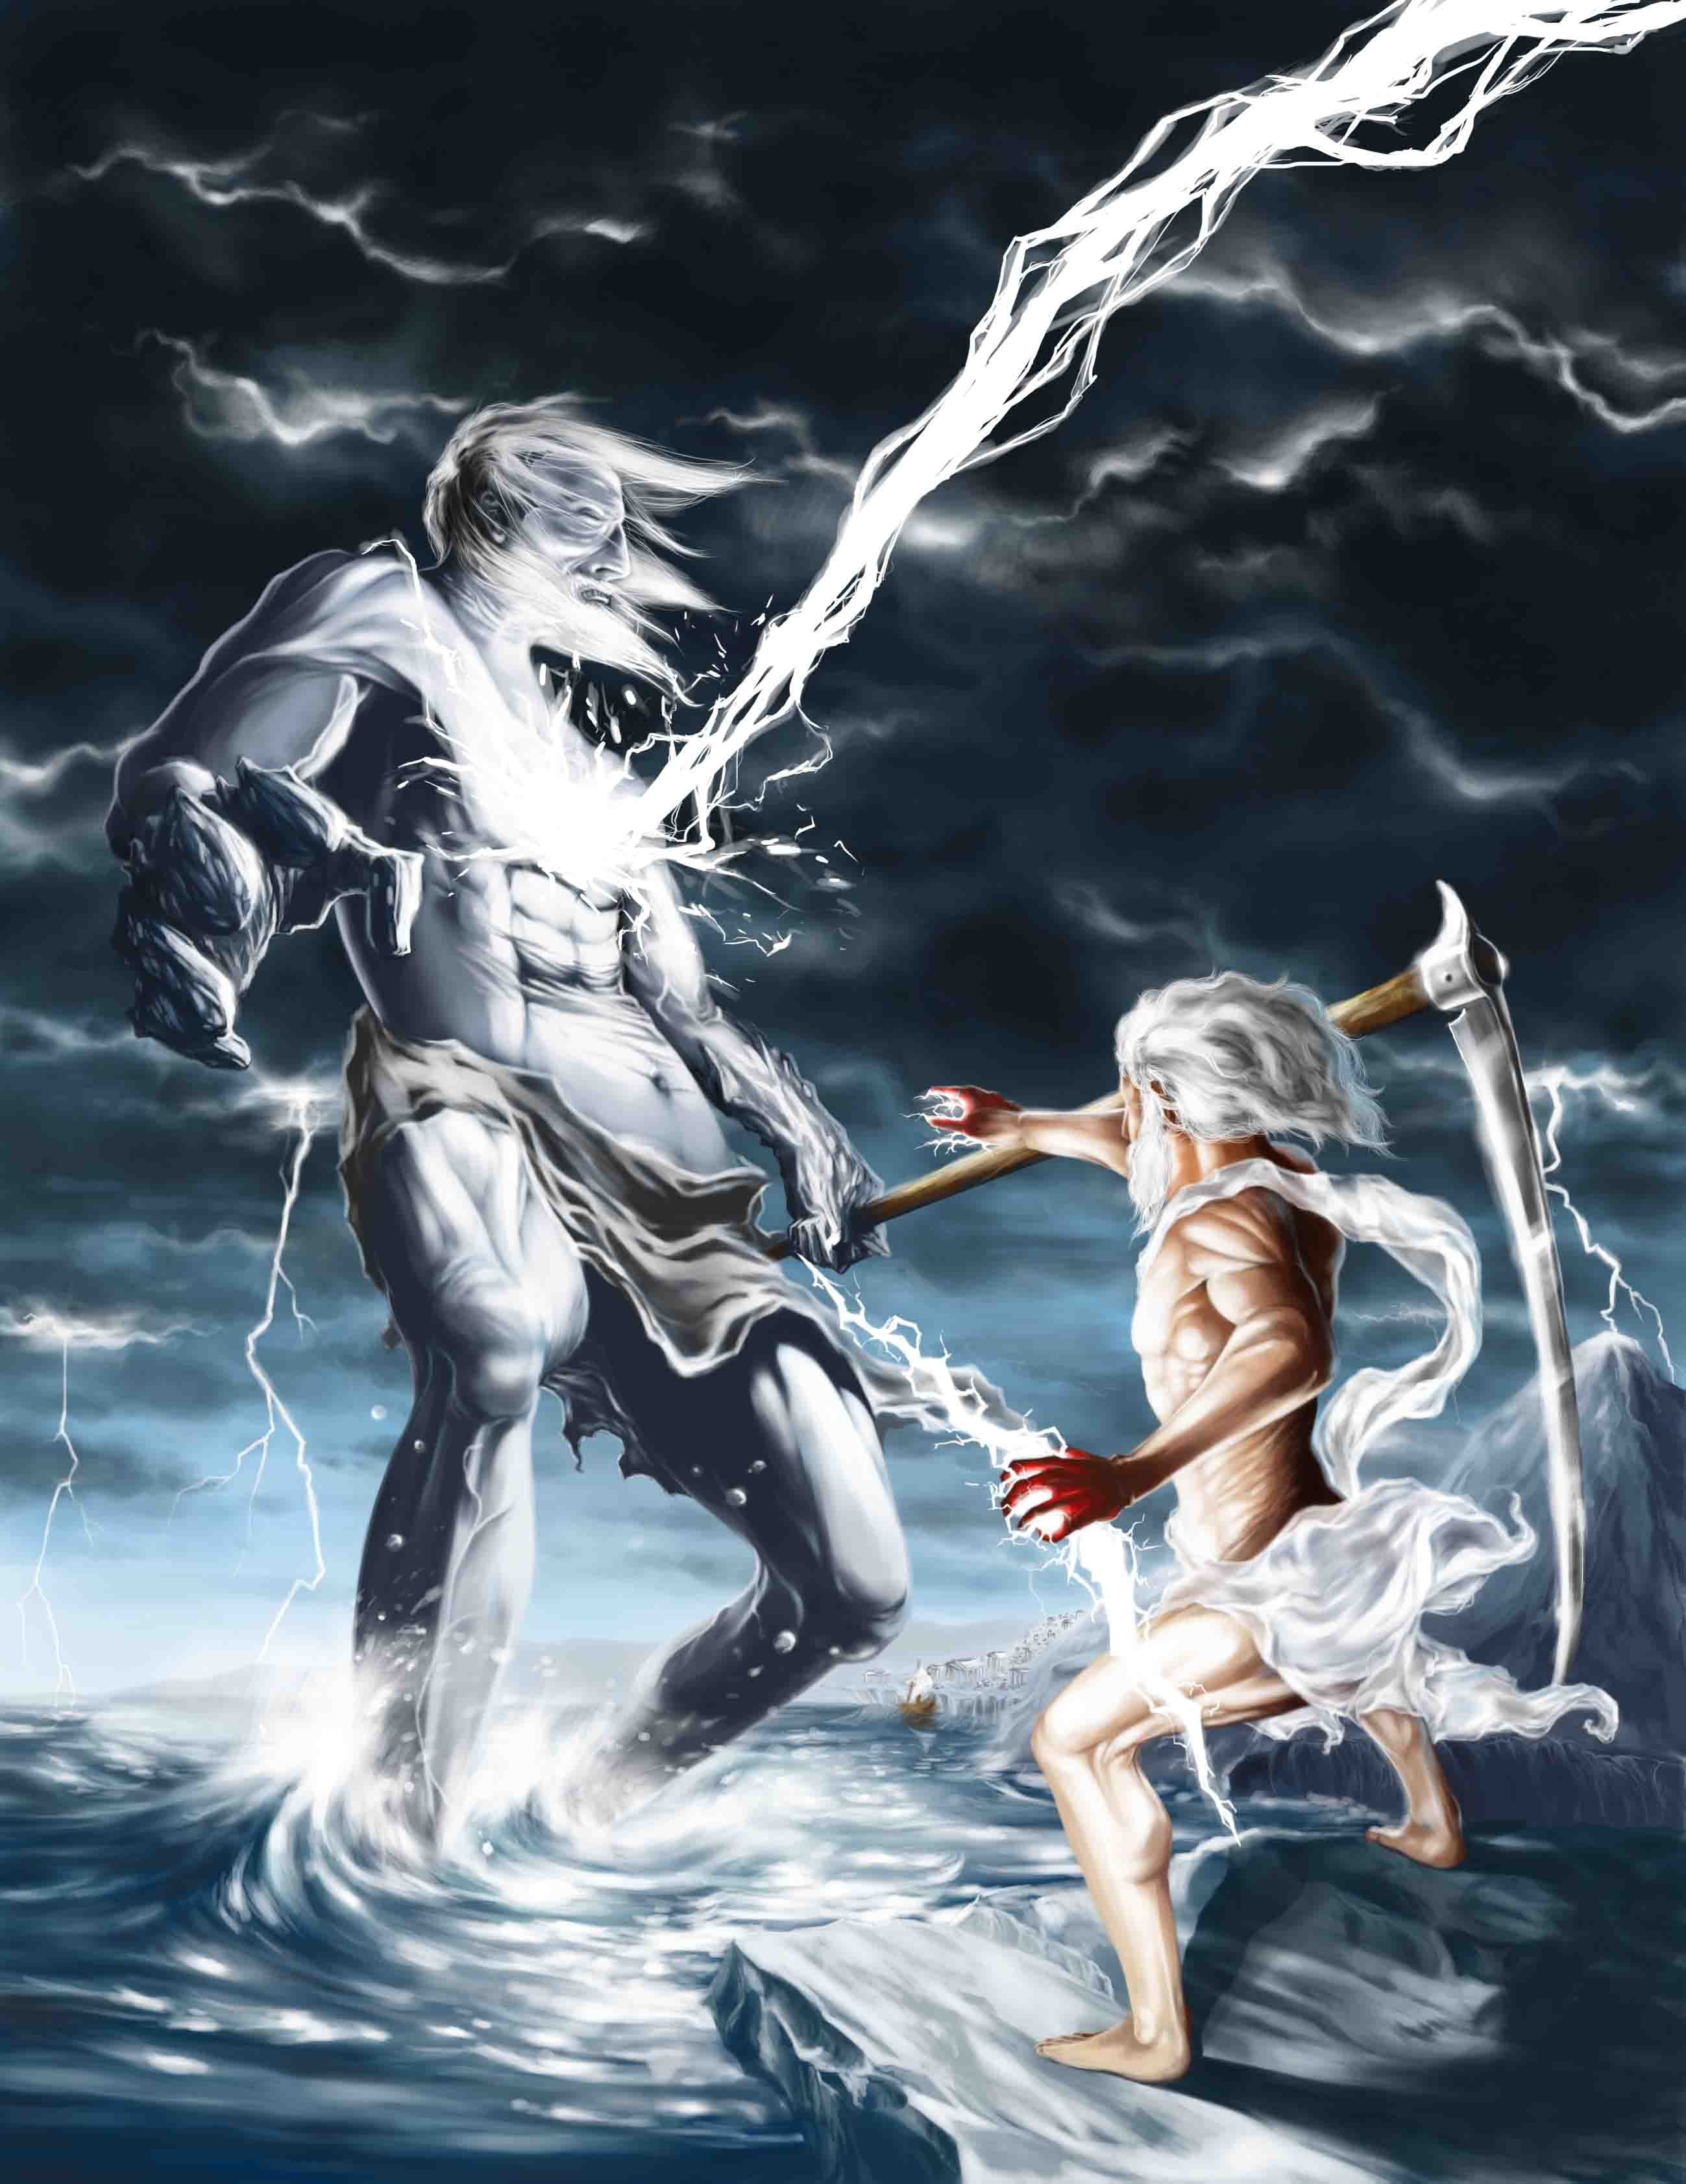 http://images.wikia.com/olympians/images/3/38/Zeus_punishment_by_JuanSan.jpg